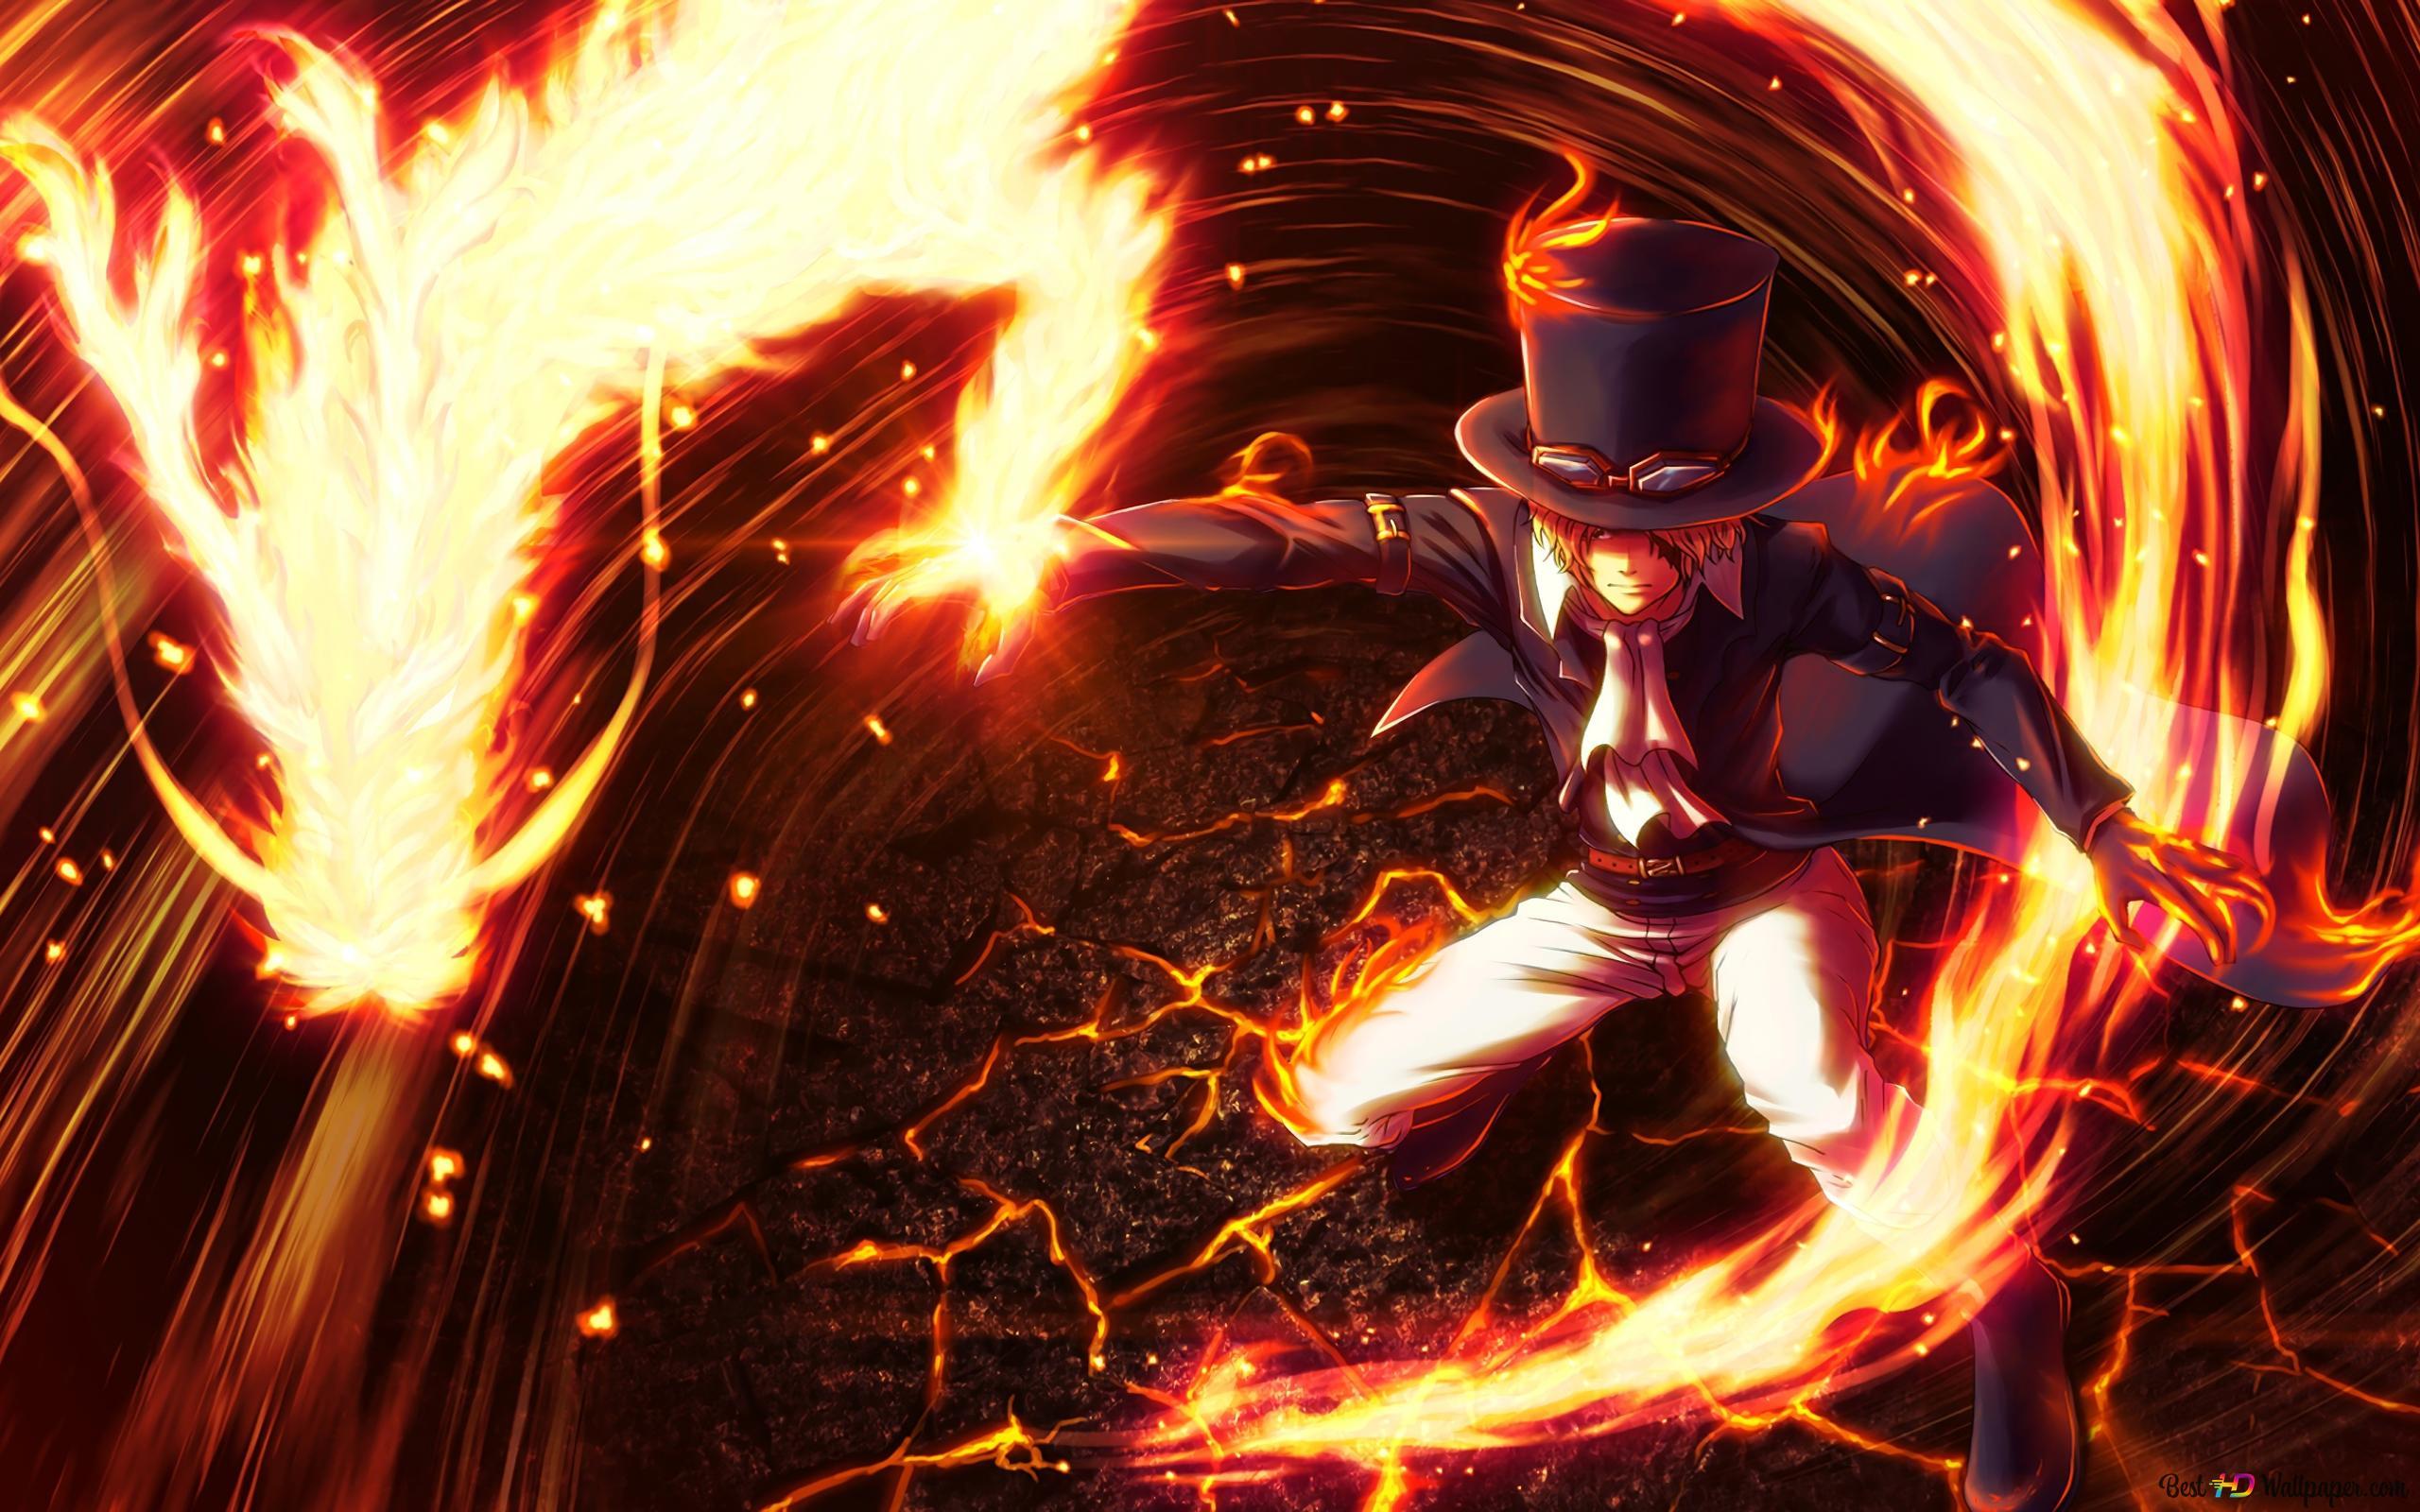 One Piece Sabo Dragon Flame Hd Wallpaper Download